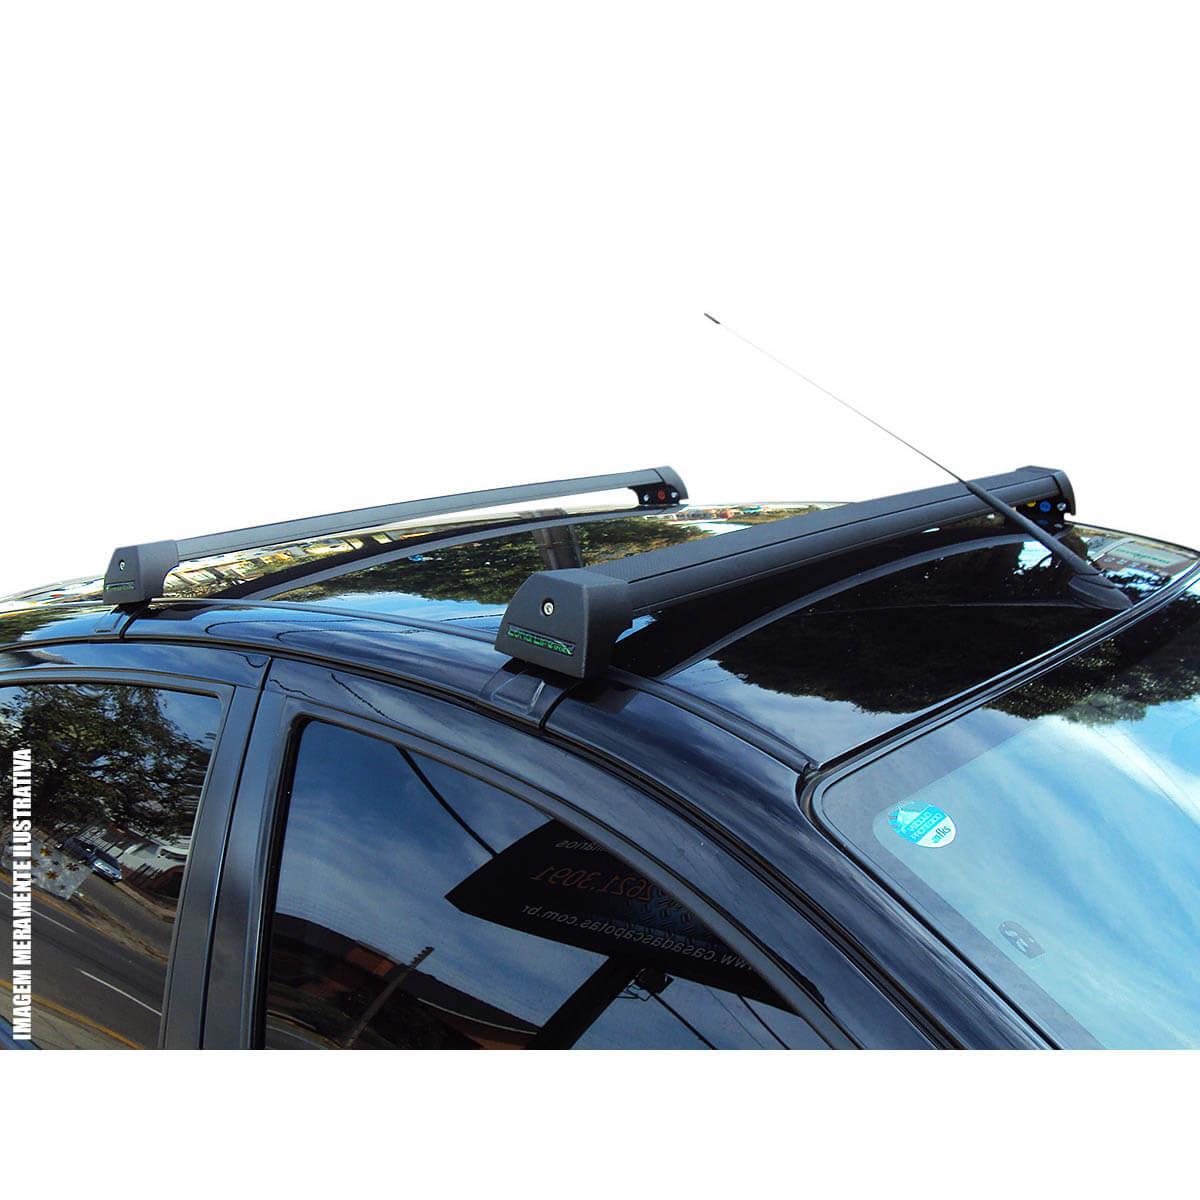 Rack de teto Long Life Sports preto Peugeot 208 2013 a 2020